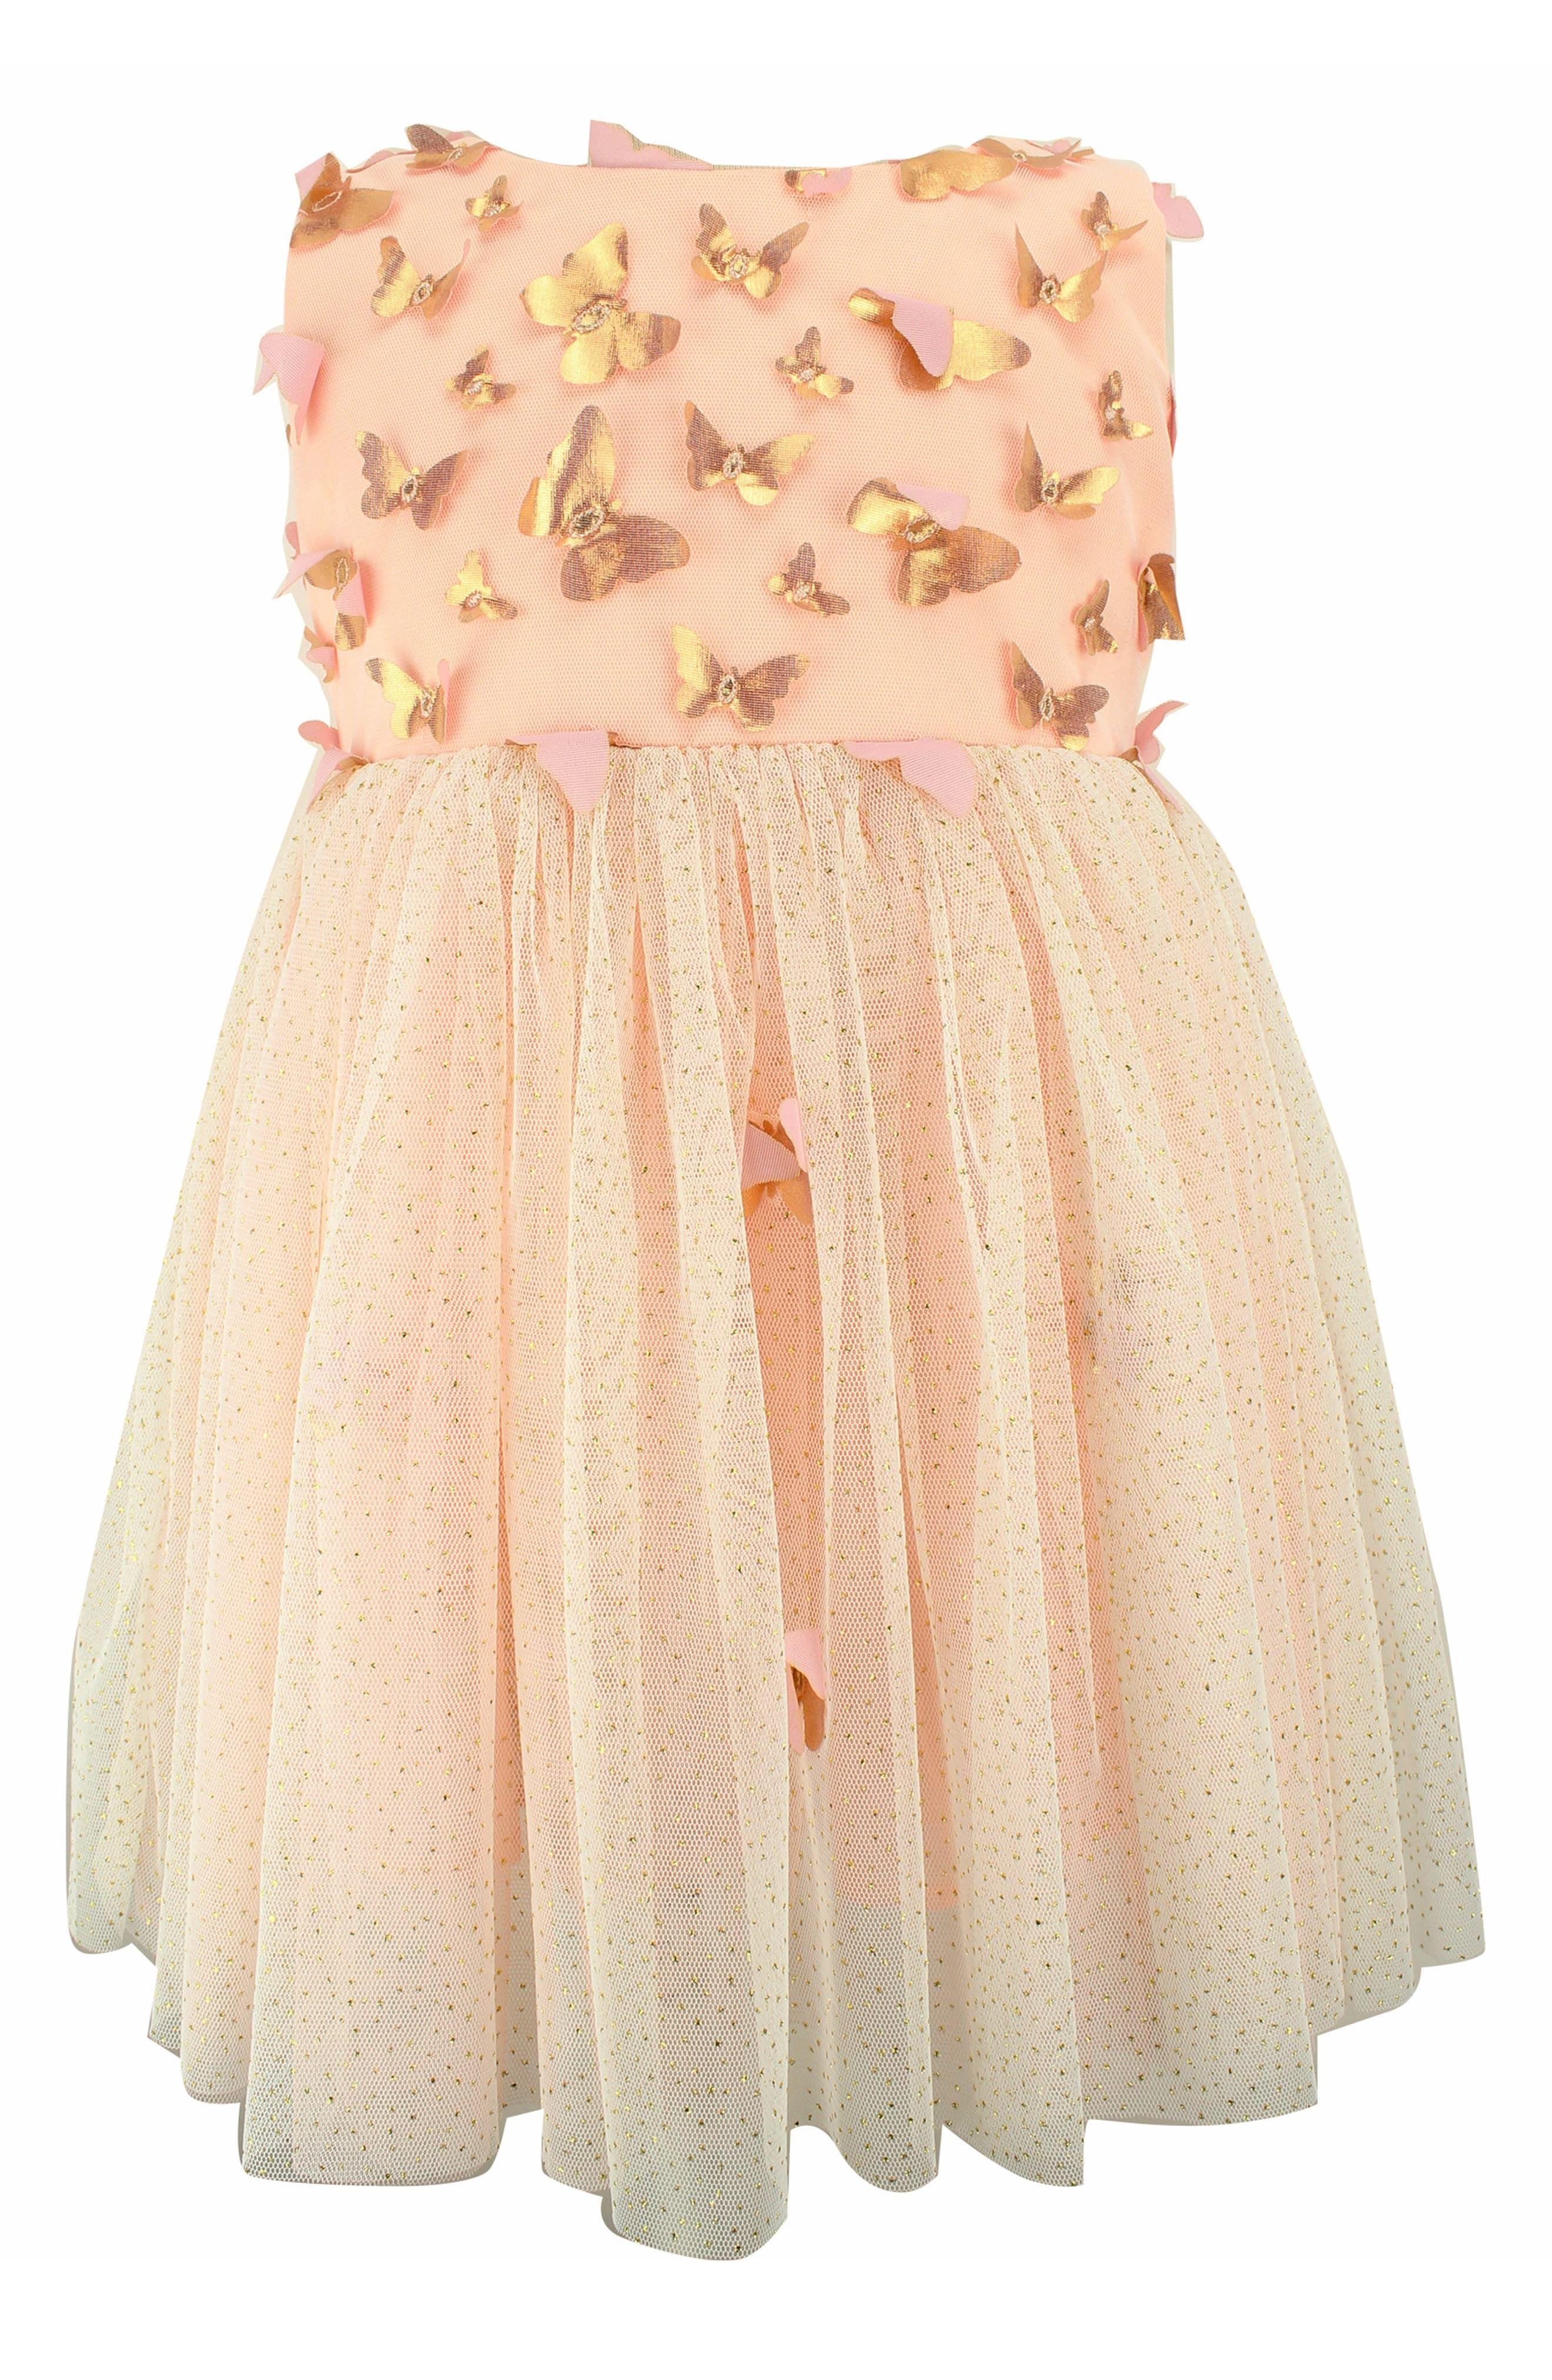 faa93574b8065 Toddler Girl's Popatu Butterfly Appliqué Tulle Dress, Size 2T - Pink ...